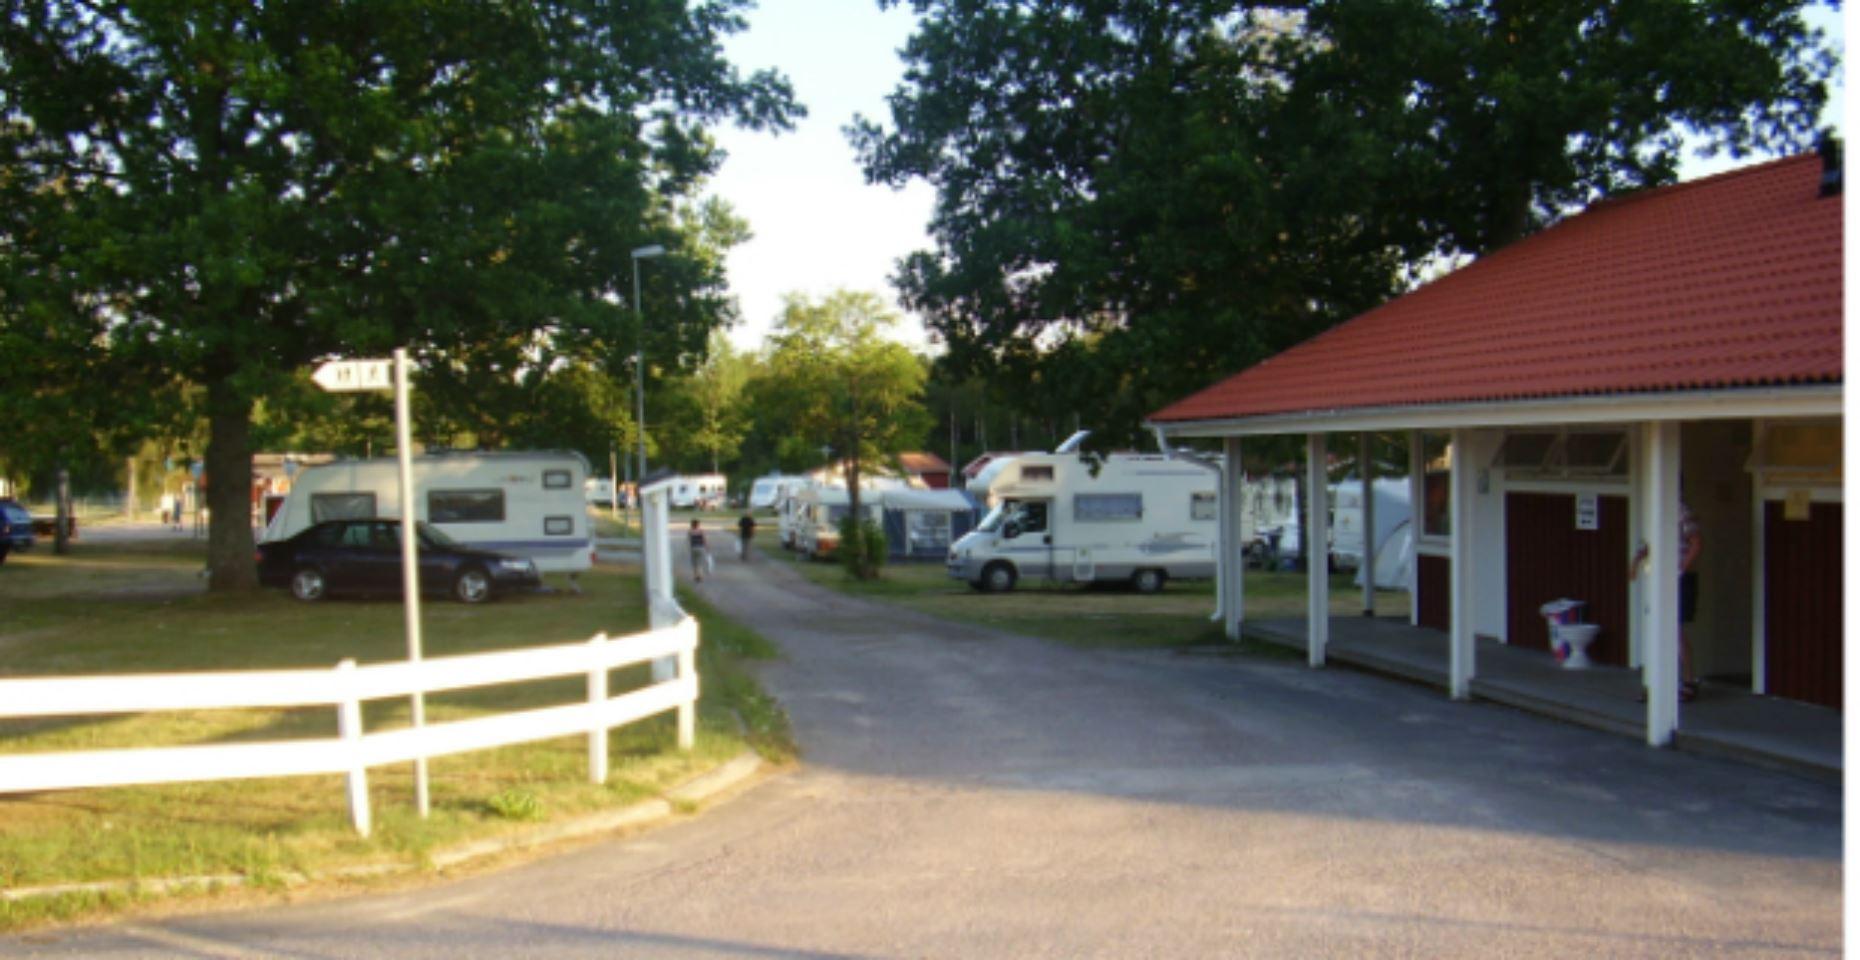 Kosta Bad & Camping